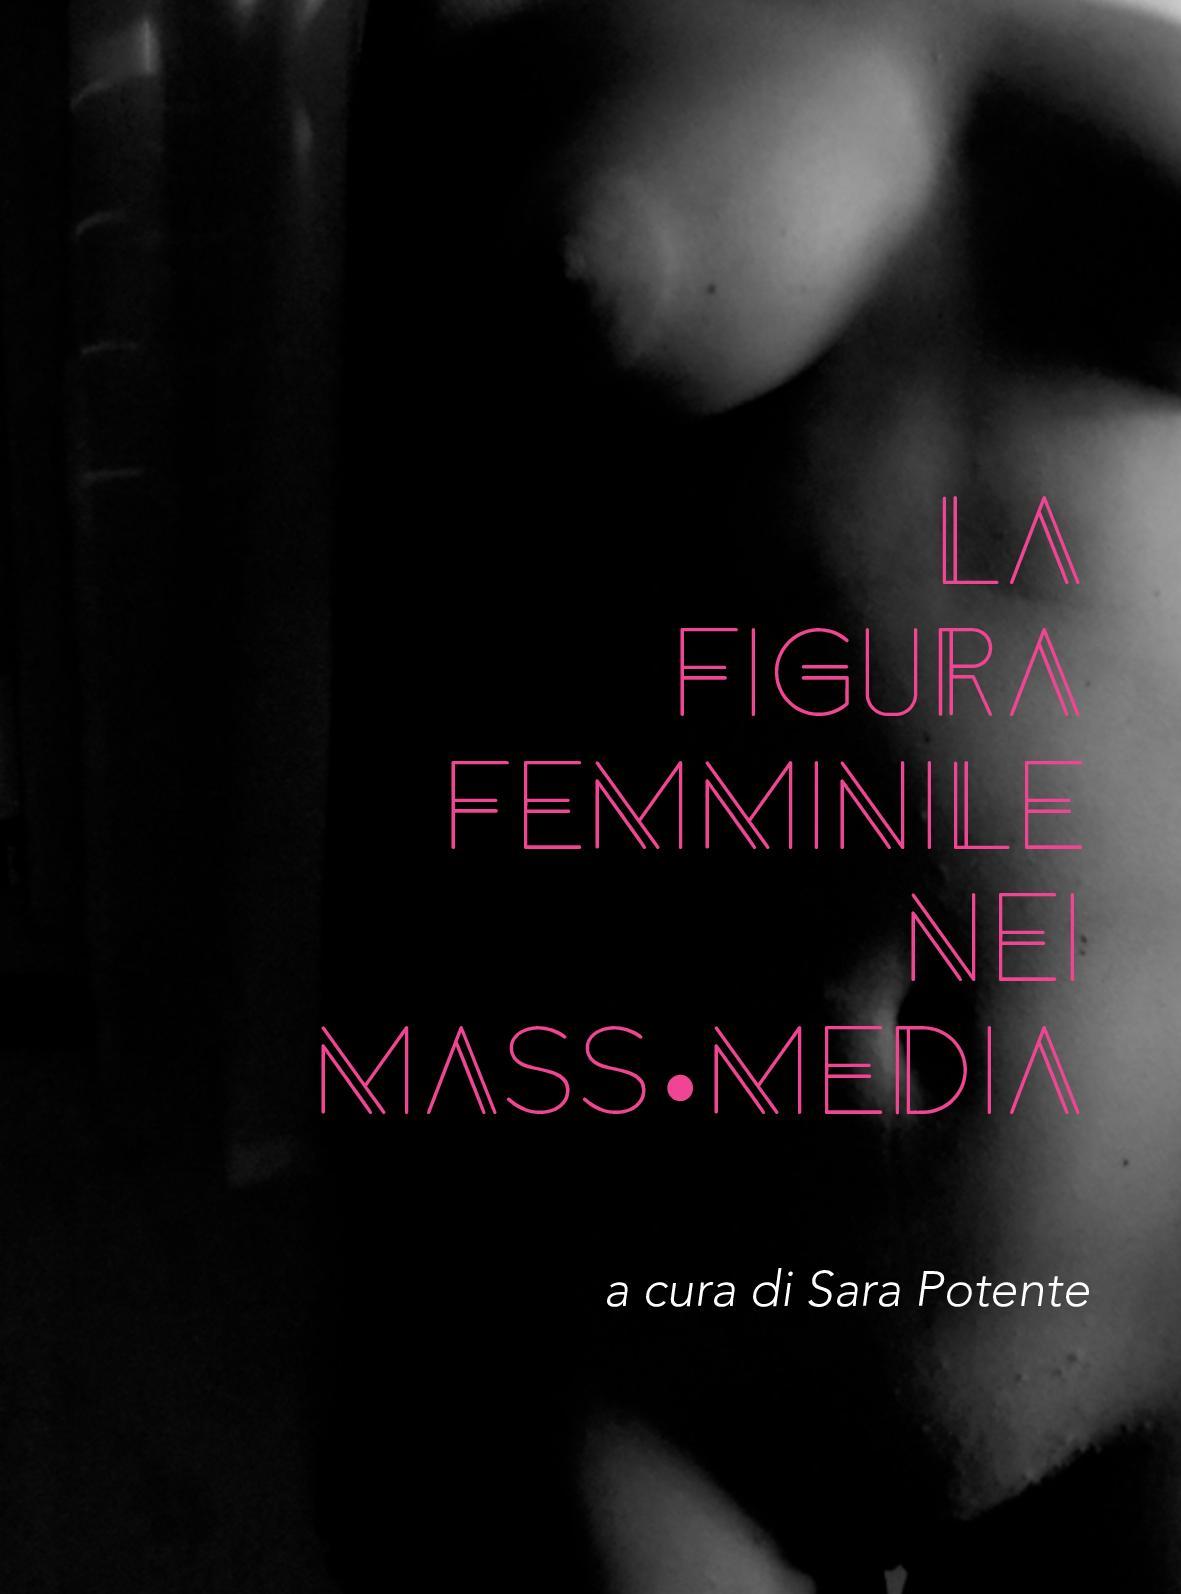 b0dfd7a7f6 Calaméo - La Figura Femminile Nei Mass-Media - tesi teorica